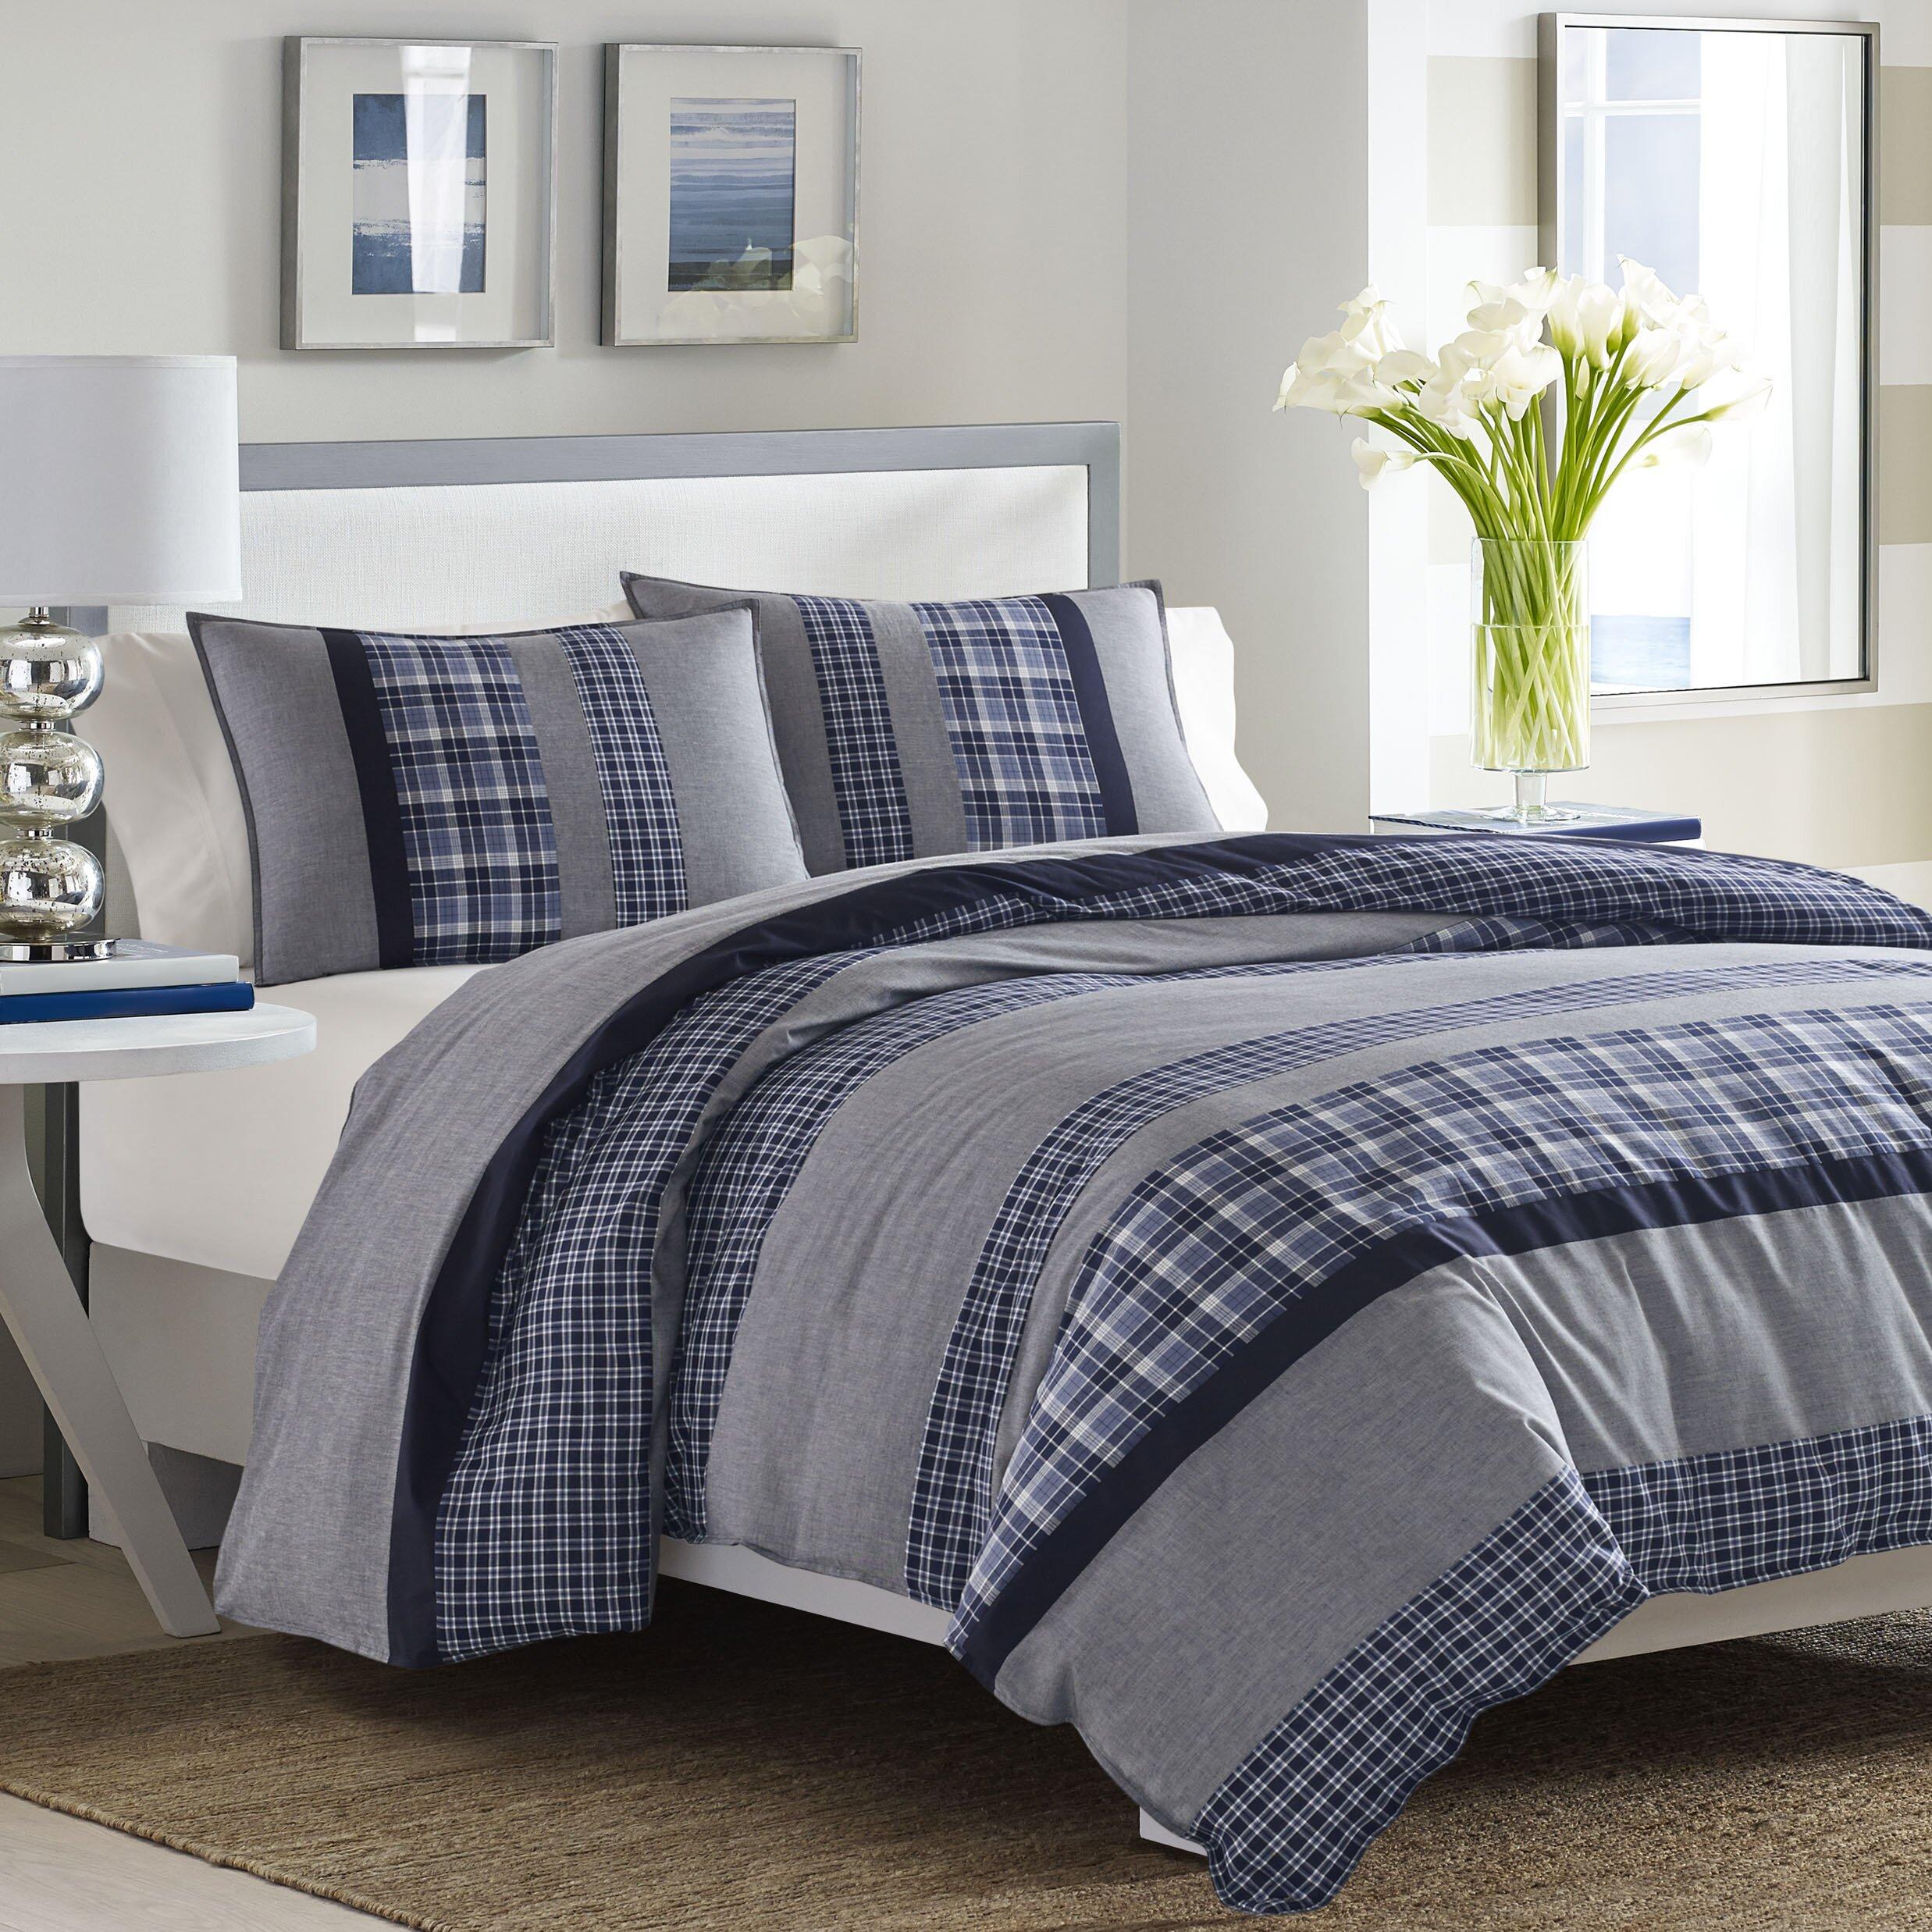 Nautica Bedroom Furniture Nautica Adelson Reversible Comforter Set Reviews Wayfairca